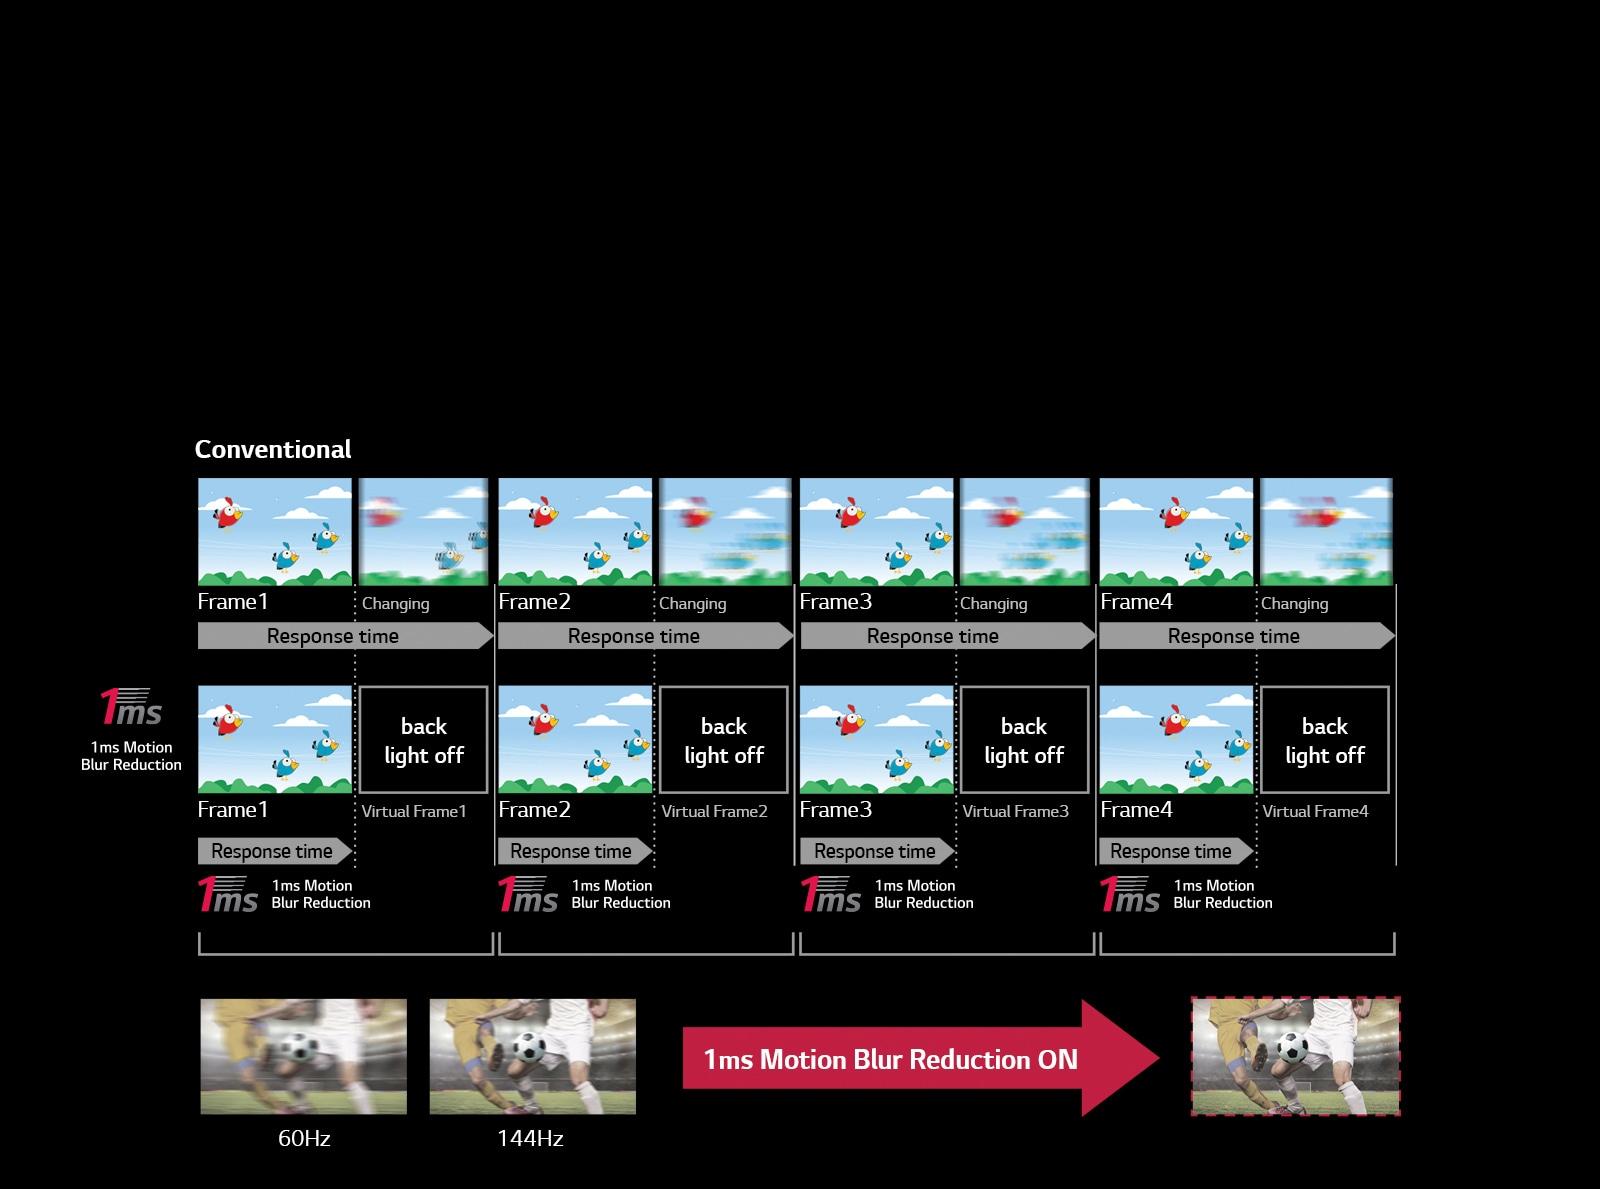 LG 27GK750F | 27 Inch Gaming Monitor | LG HK